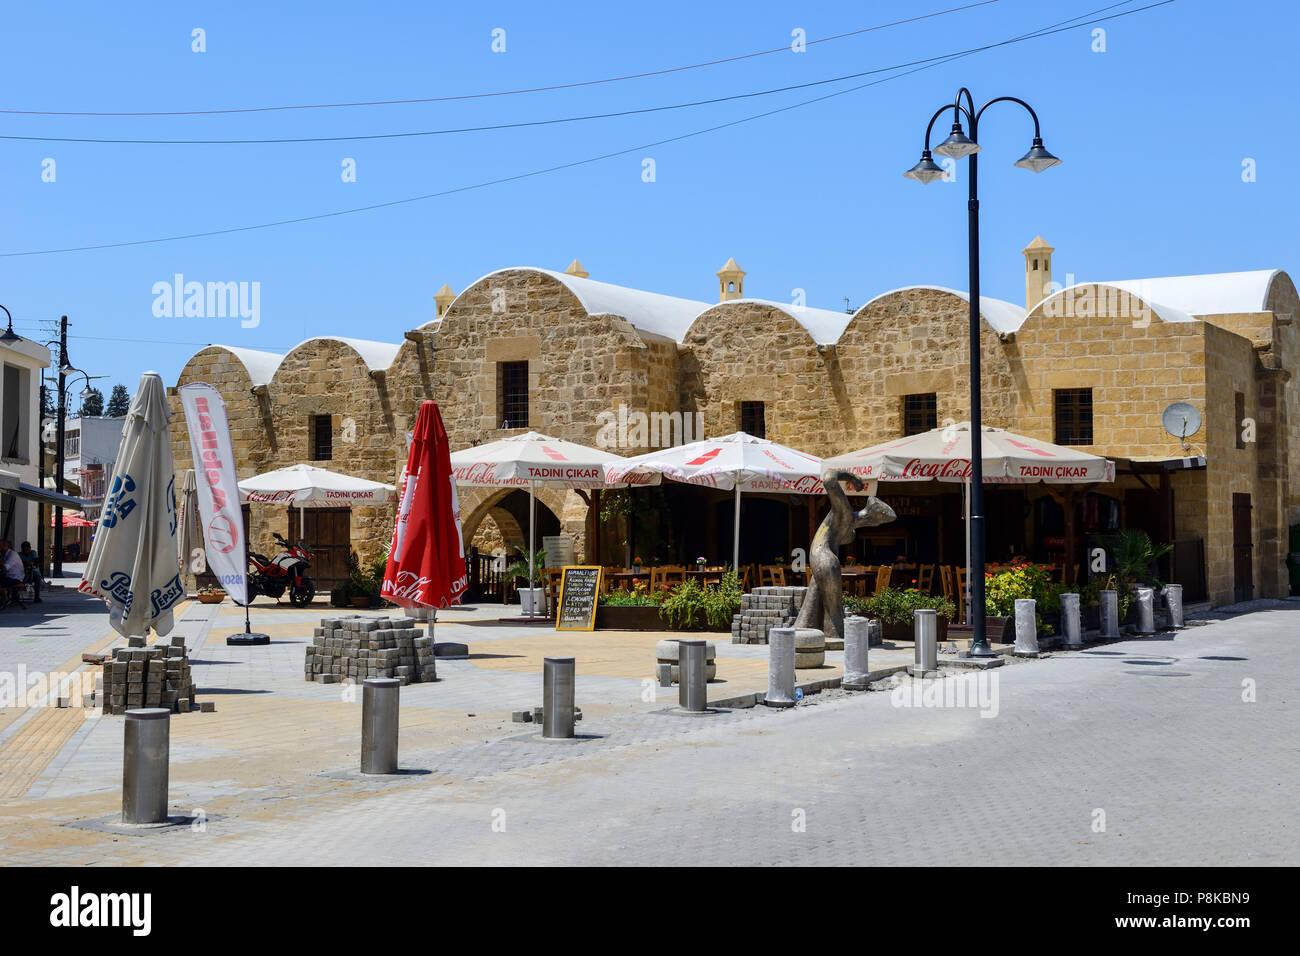 Recently restored Kumarcilar Han (Gambler's Inn), a former caravanserai, in North Nicosia (Lefkosa), Turkish Republic of Northern Cyprus - Stock Image